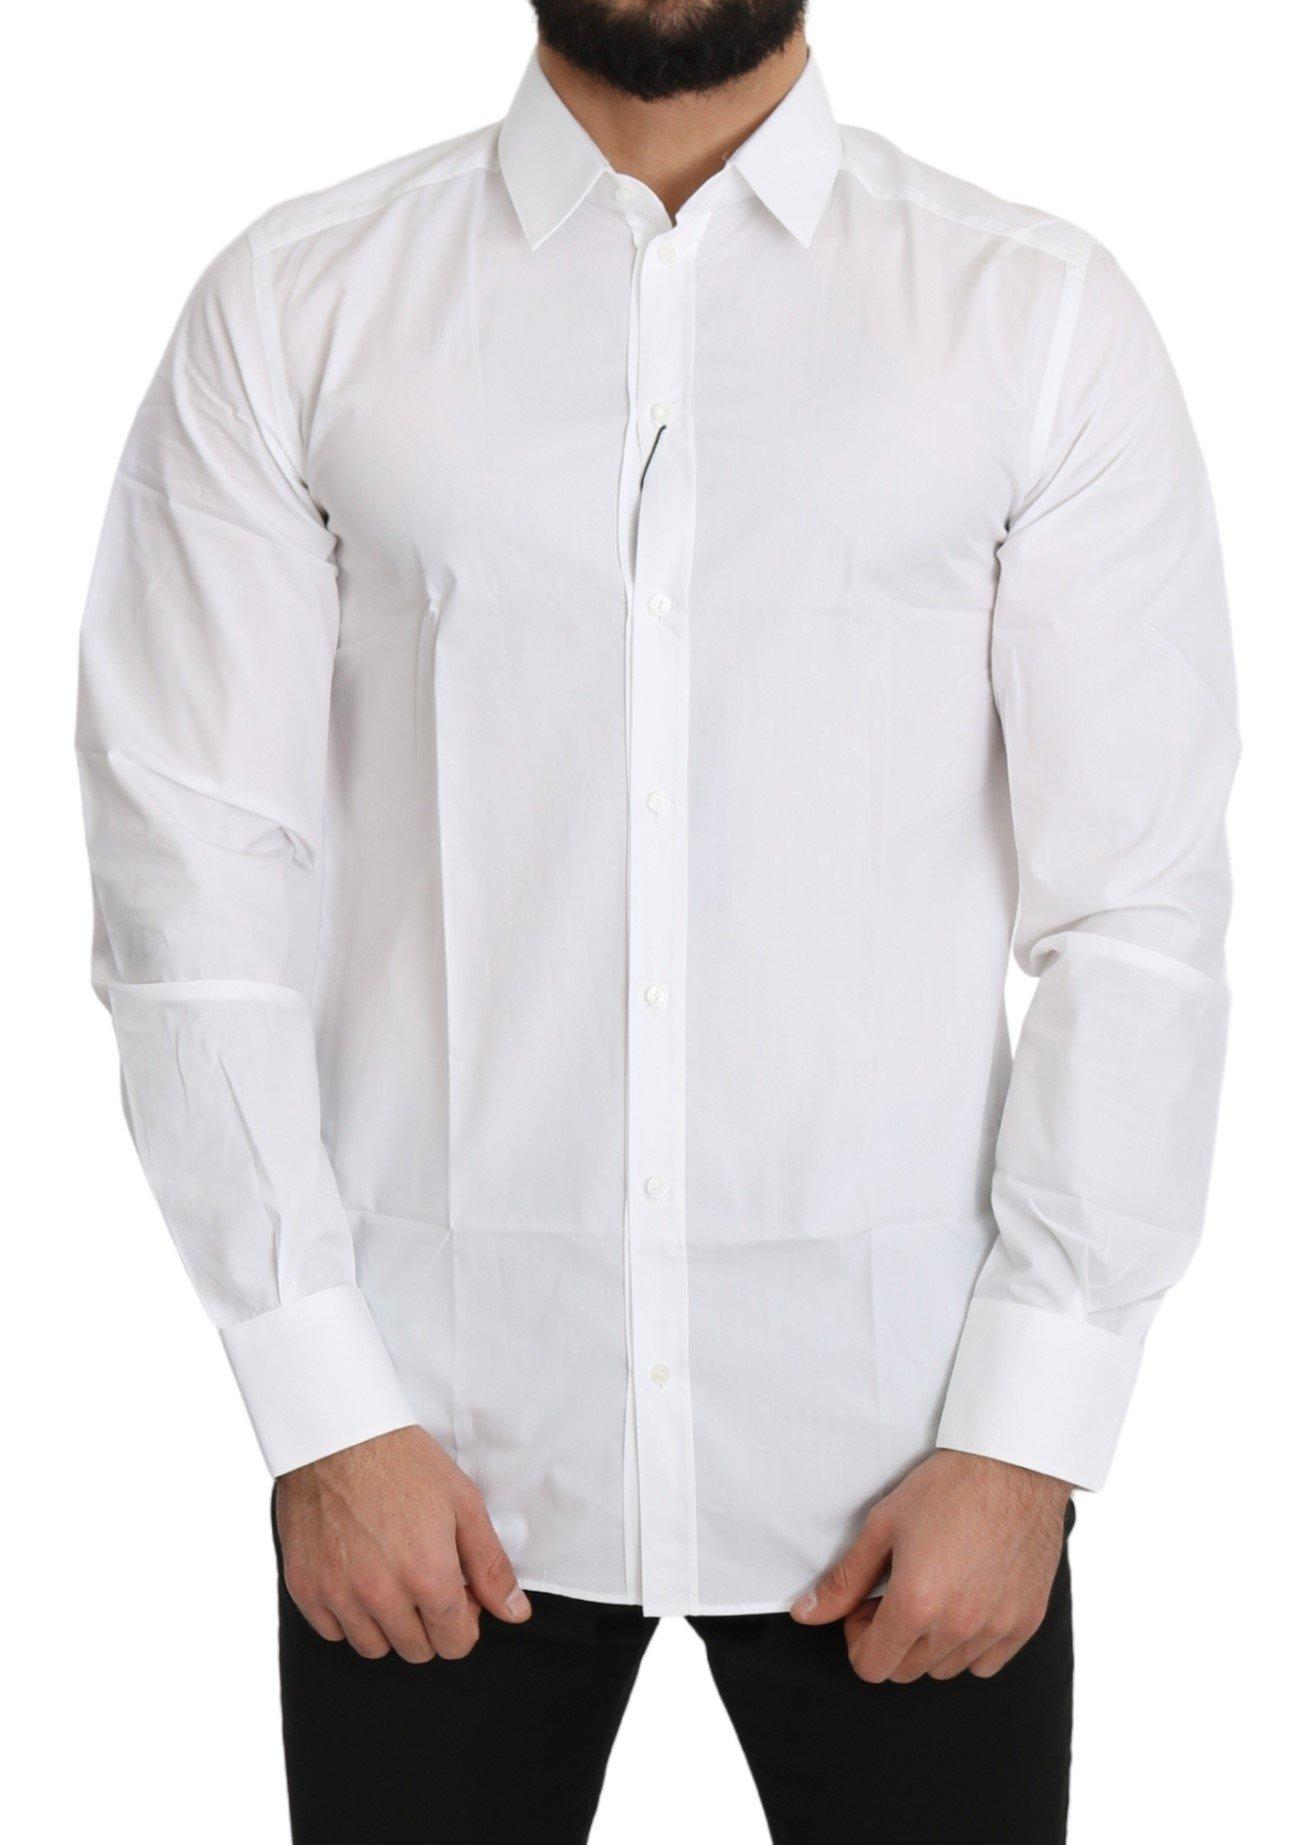 Dolce & Gabbana Men's Solid Cotton Shirt White TSH5169 - IT41 | L